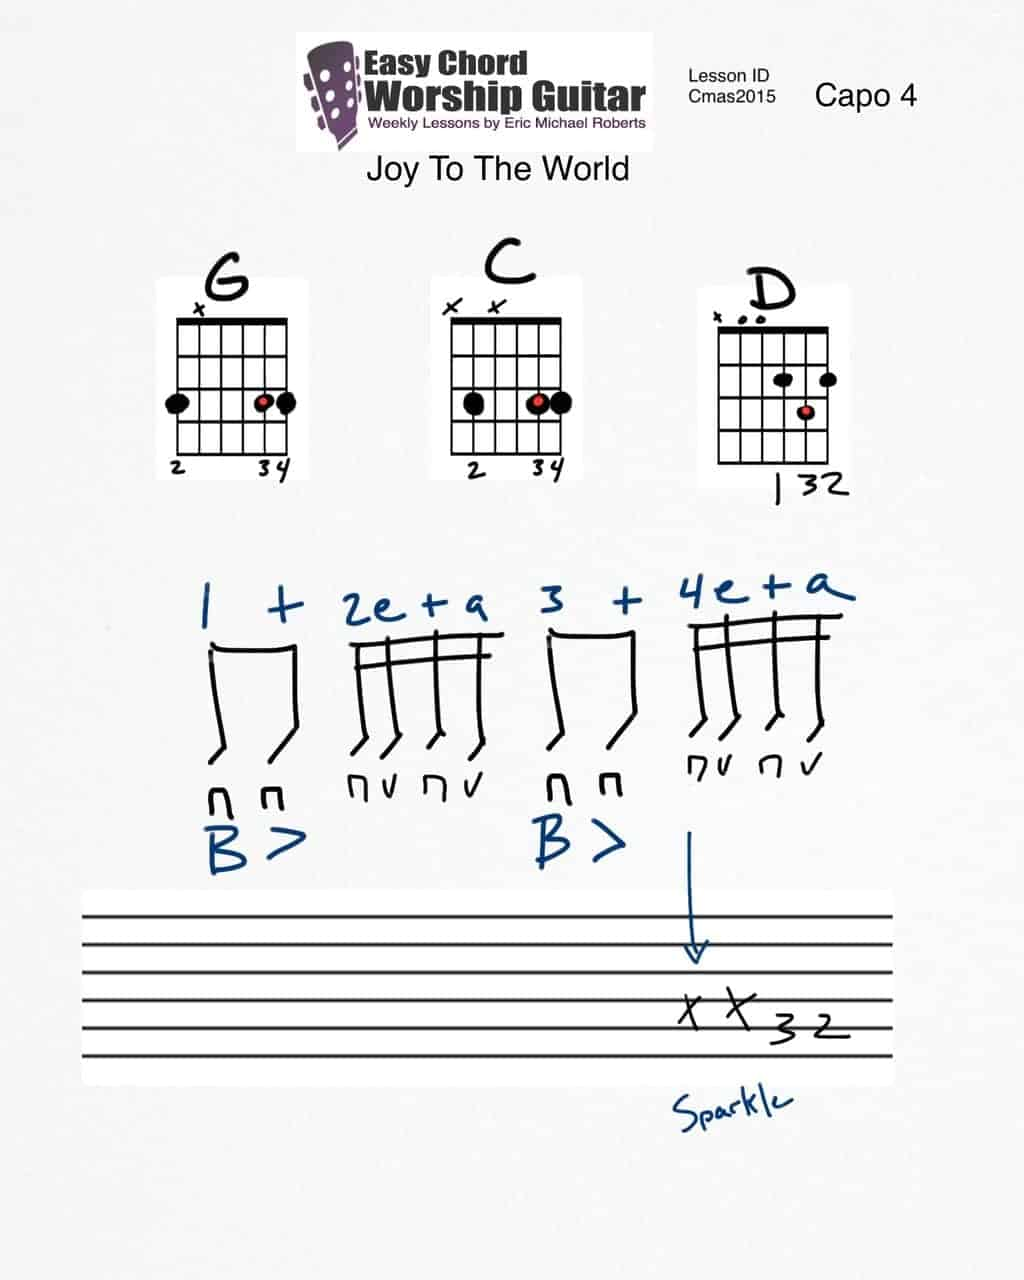 joytotheworld-lesson